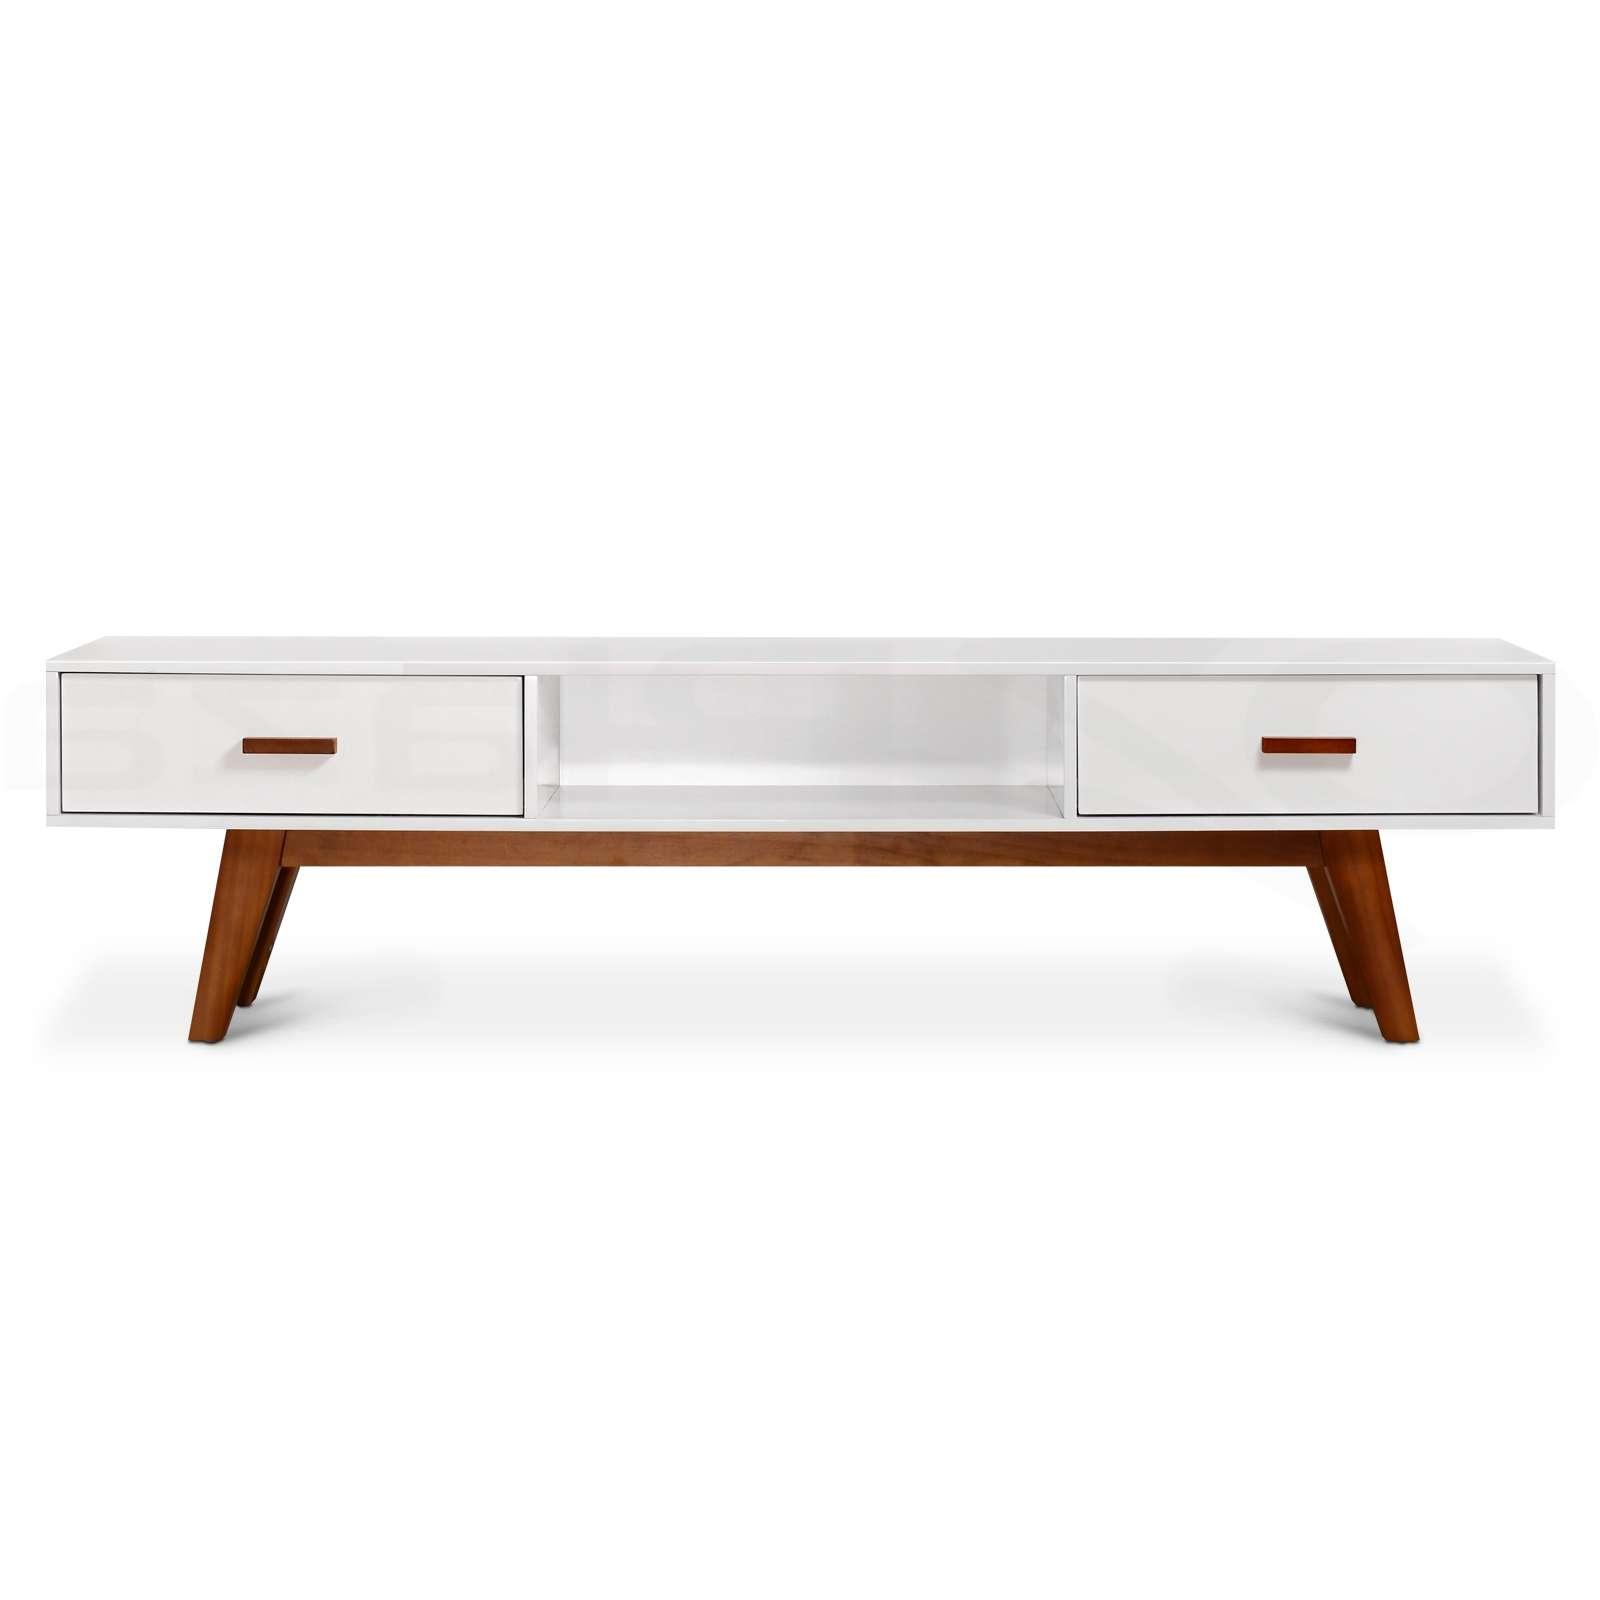 Tv Stand Cabinet Scandinavian Retro Lowline Furniture In Scandinavian Design Tv Cabinets (View 19 of 20)